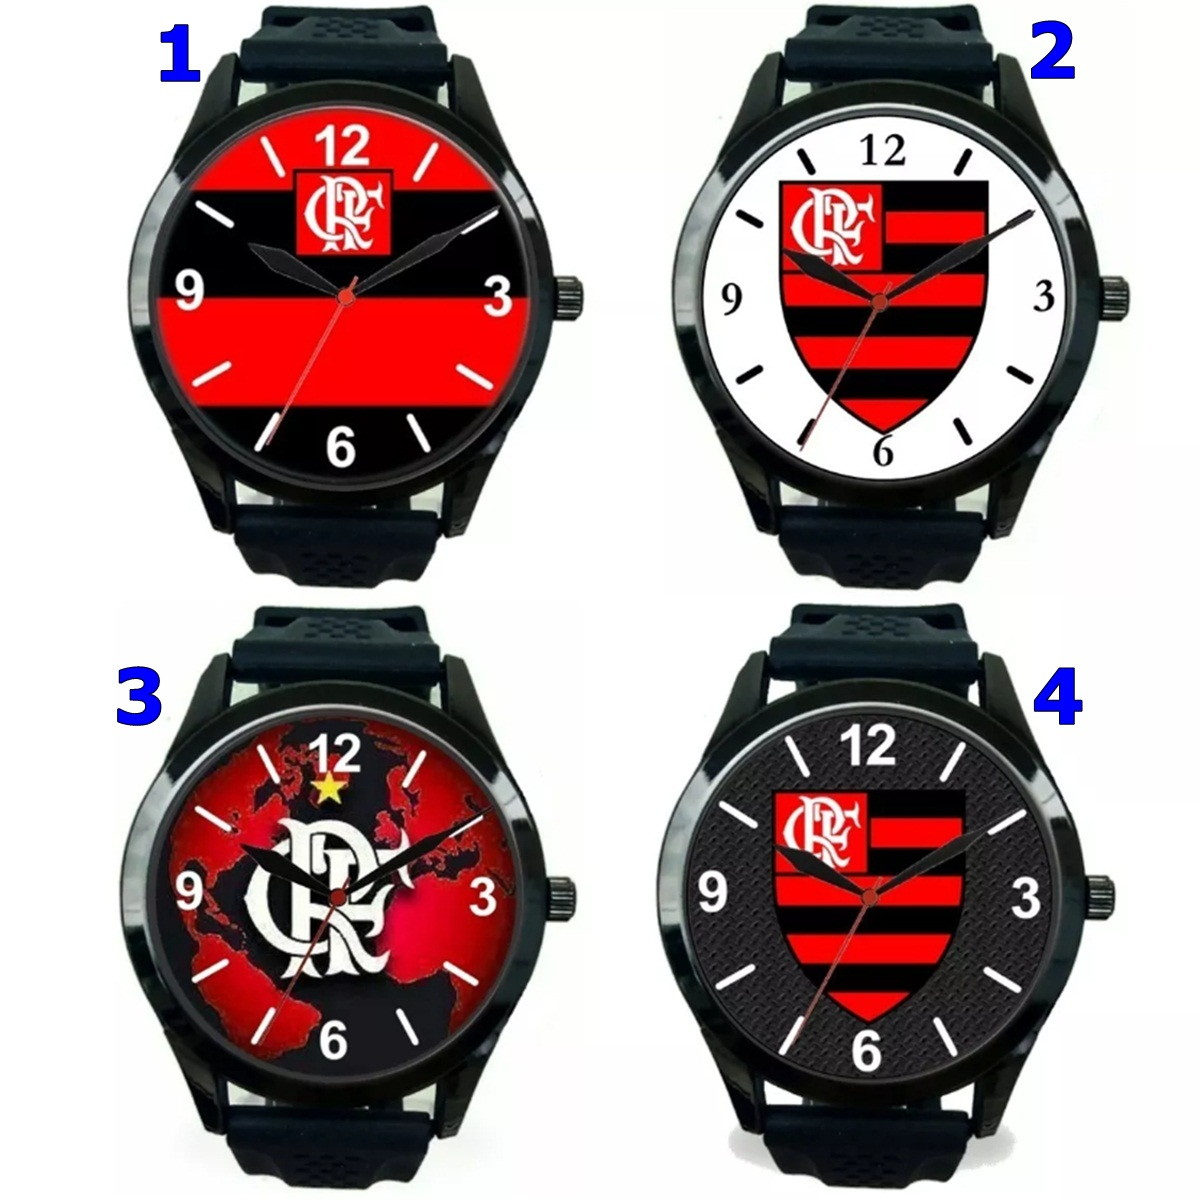 88279b6ddc483 1 Relógio pulso personalizado esportivo Flamengo barato no Elo7 ...